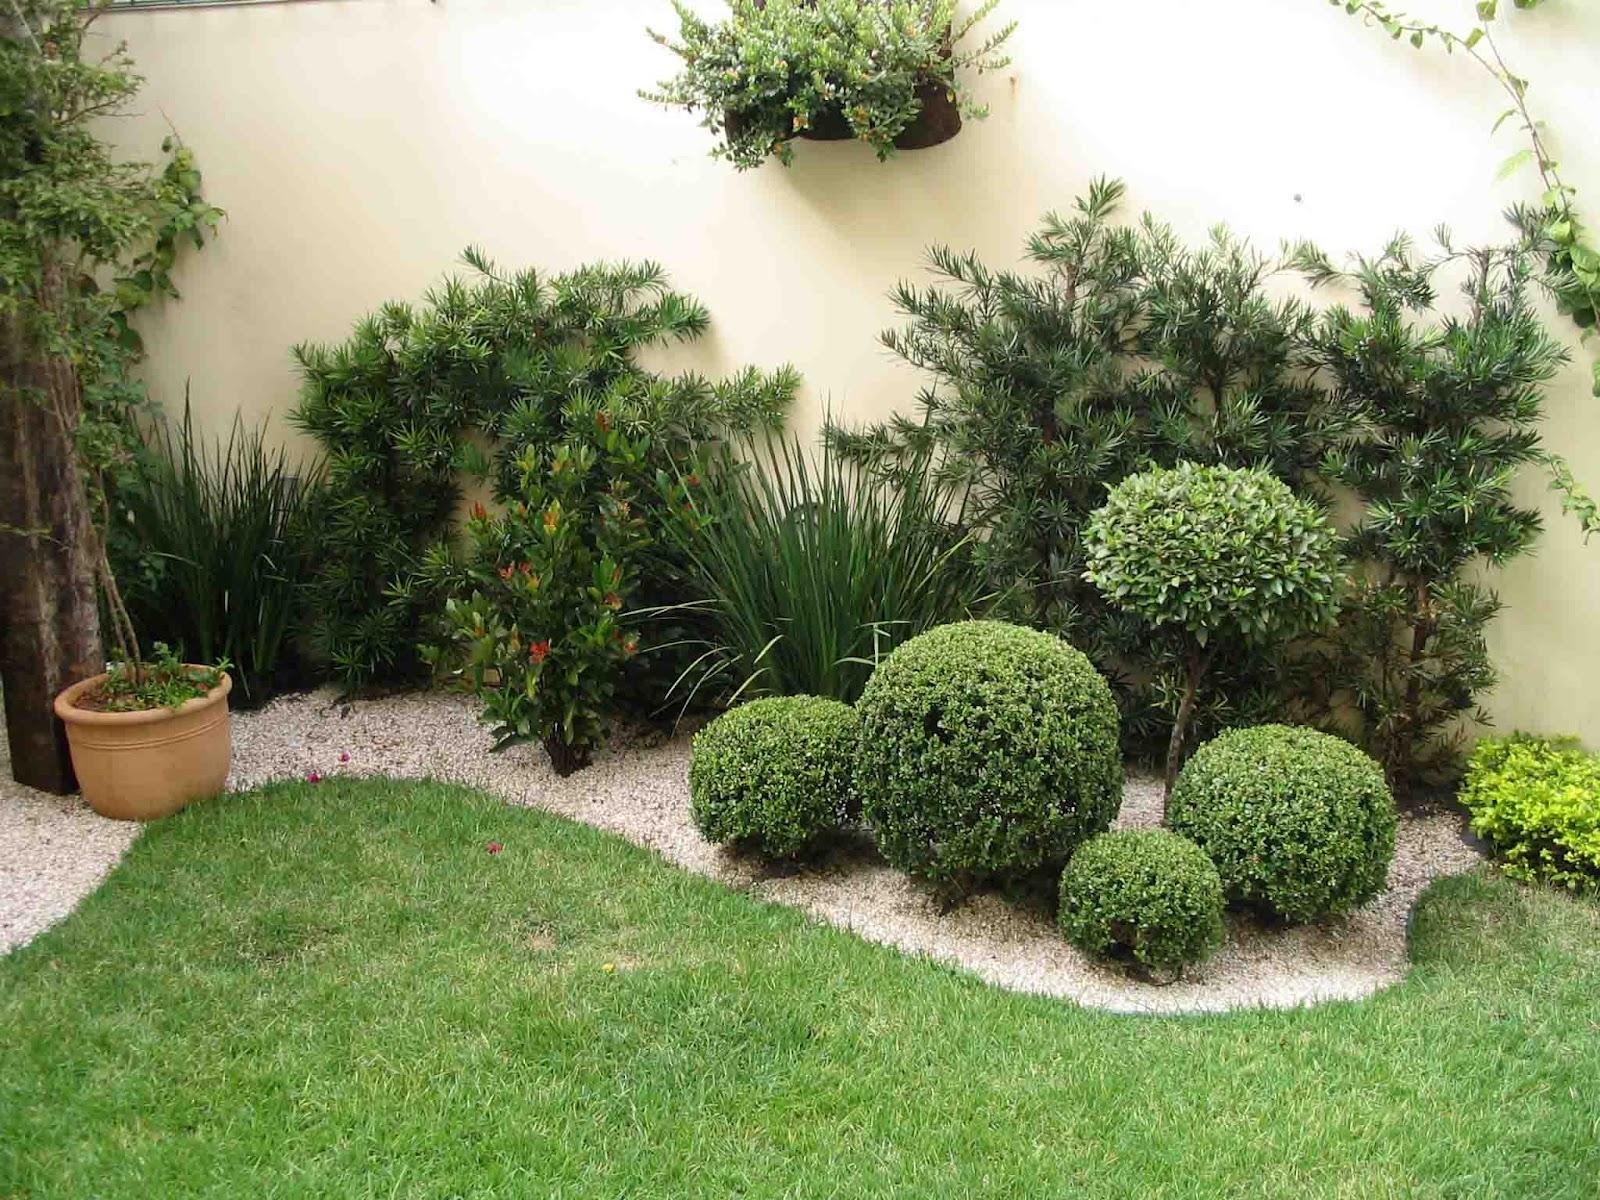 pedras jardim baratas : pedras jardim baratas:DECORAÇÃO DE JARDIM COM PEDRAS